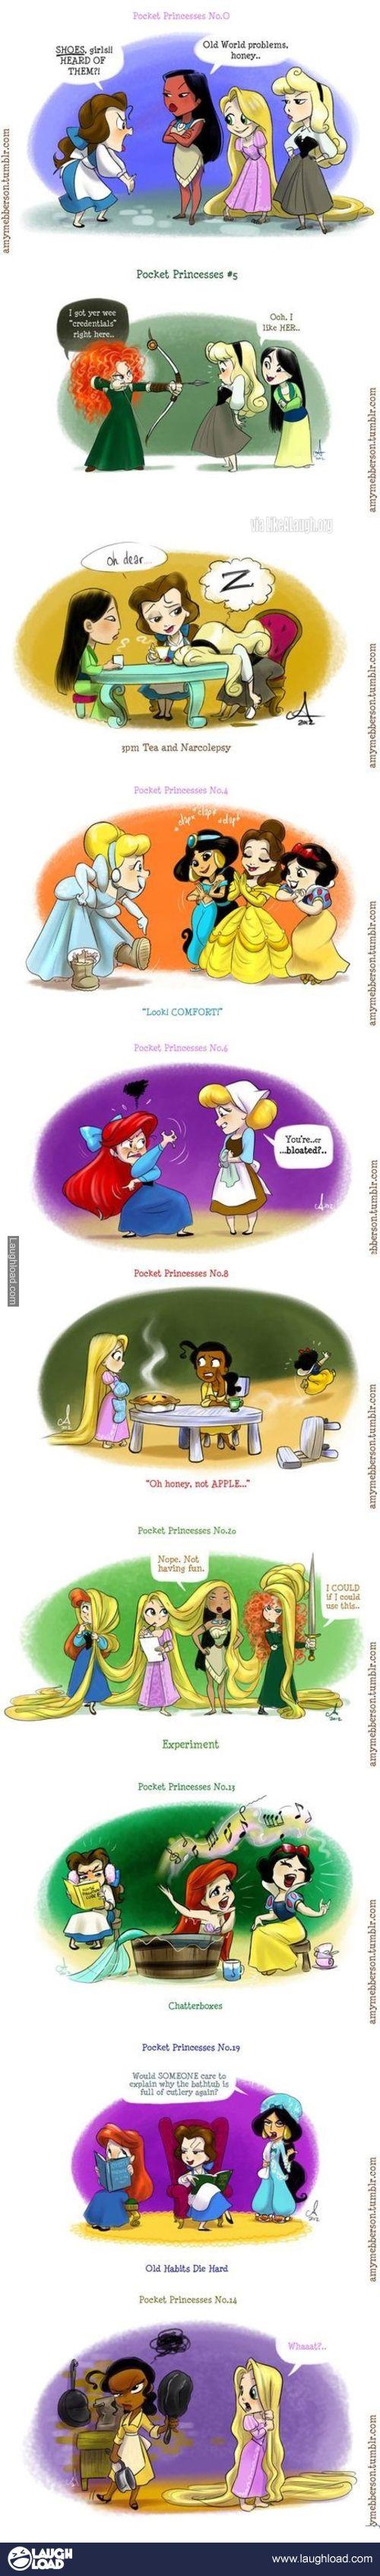 cute Disney Princesses